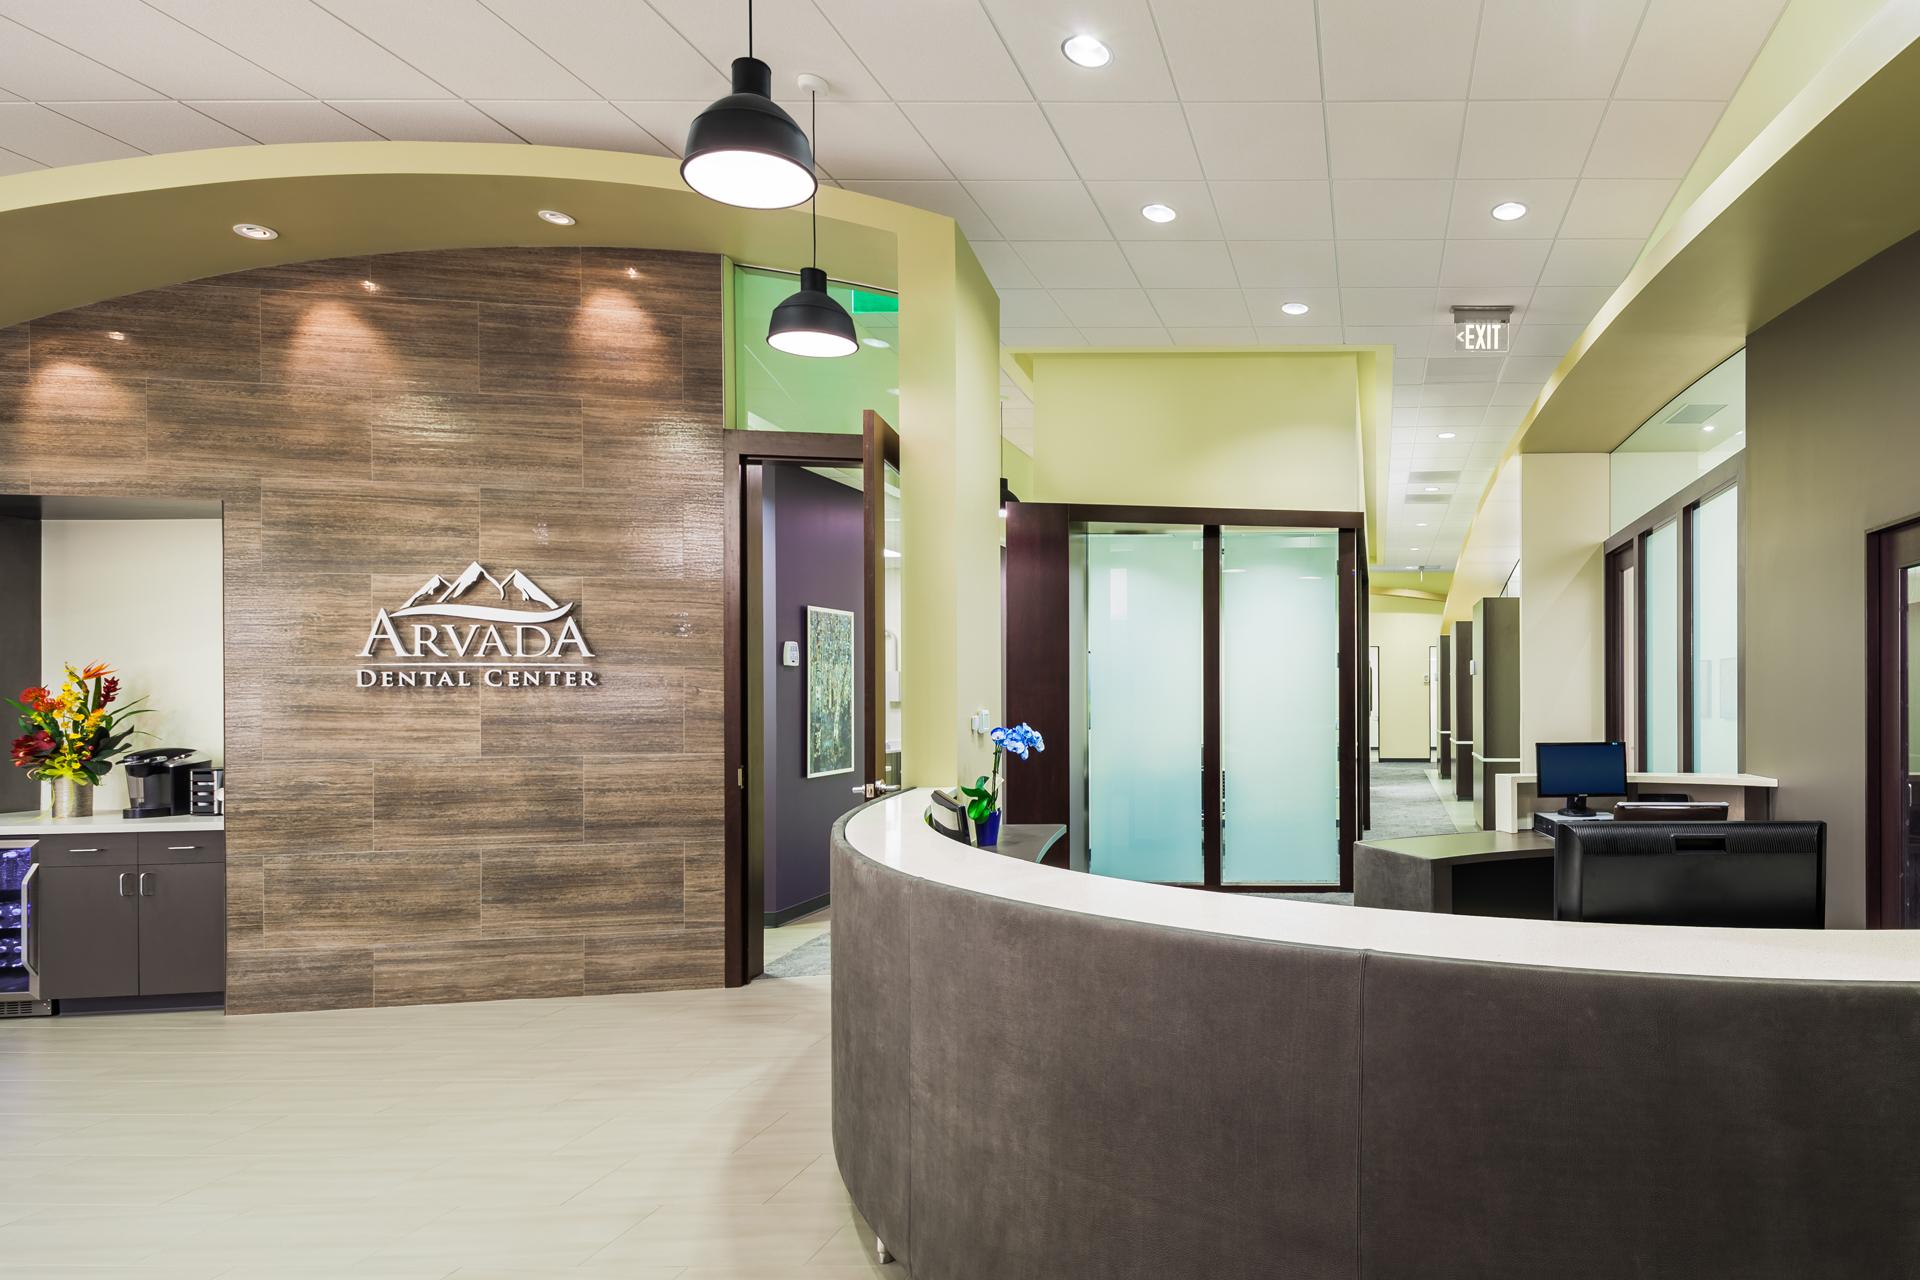 Arvada Dental Center Office Design By JoeArchitect